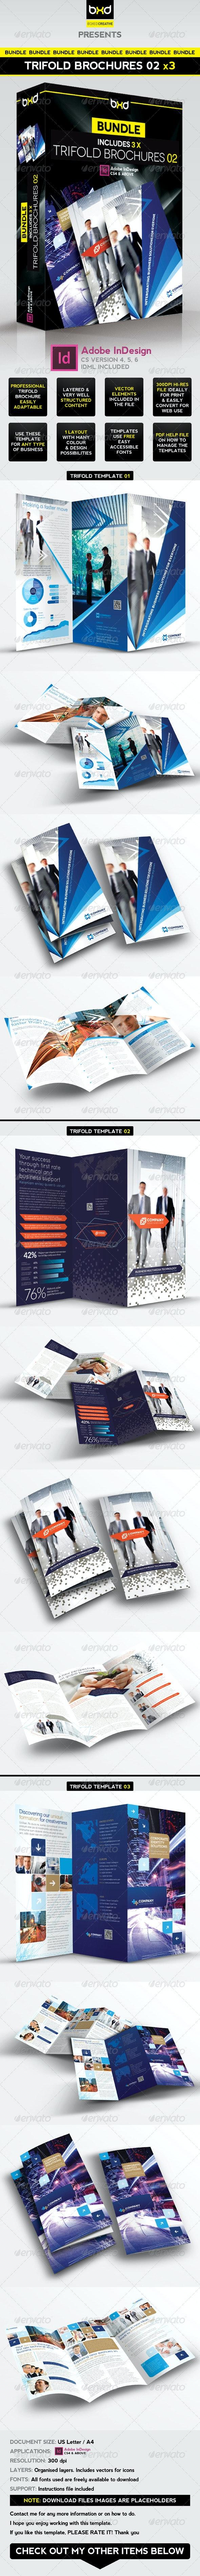 Trifold Brochures Bundle - InDesign Layout 02 - Corporate Brochures